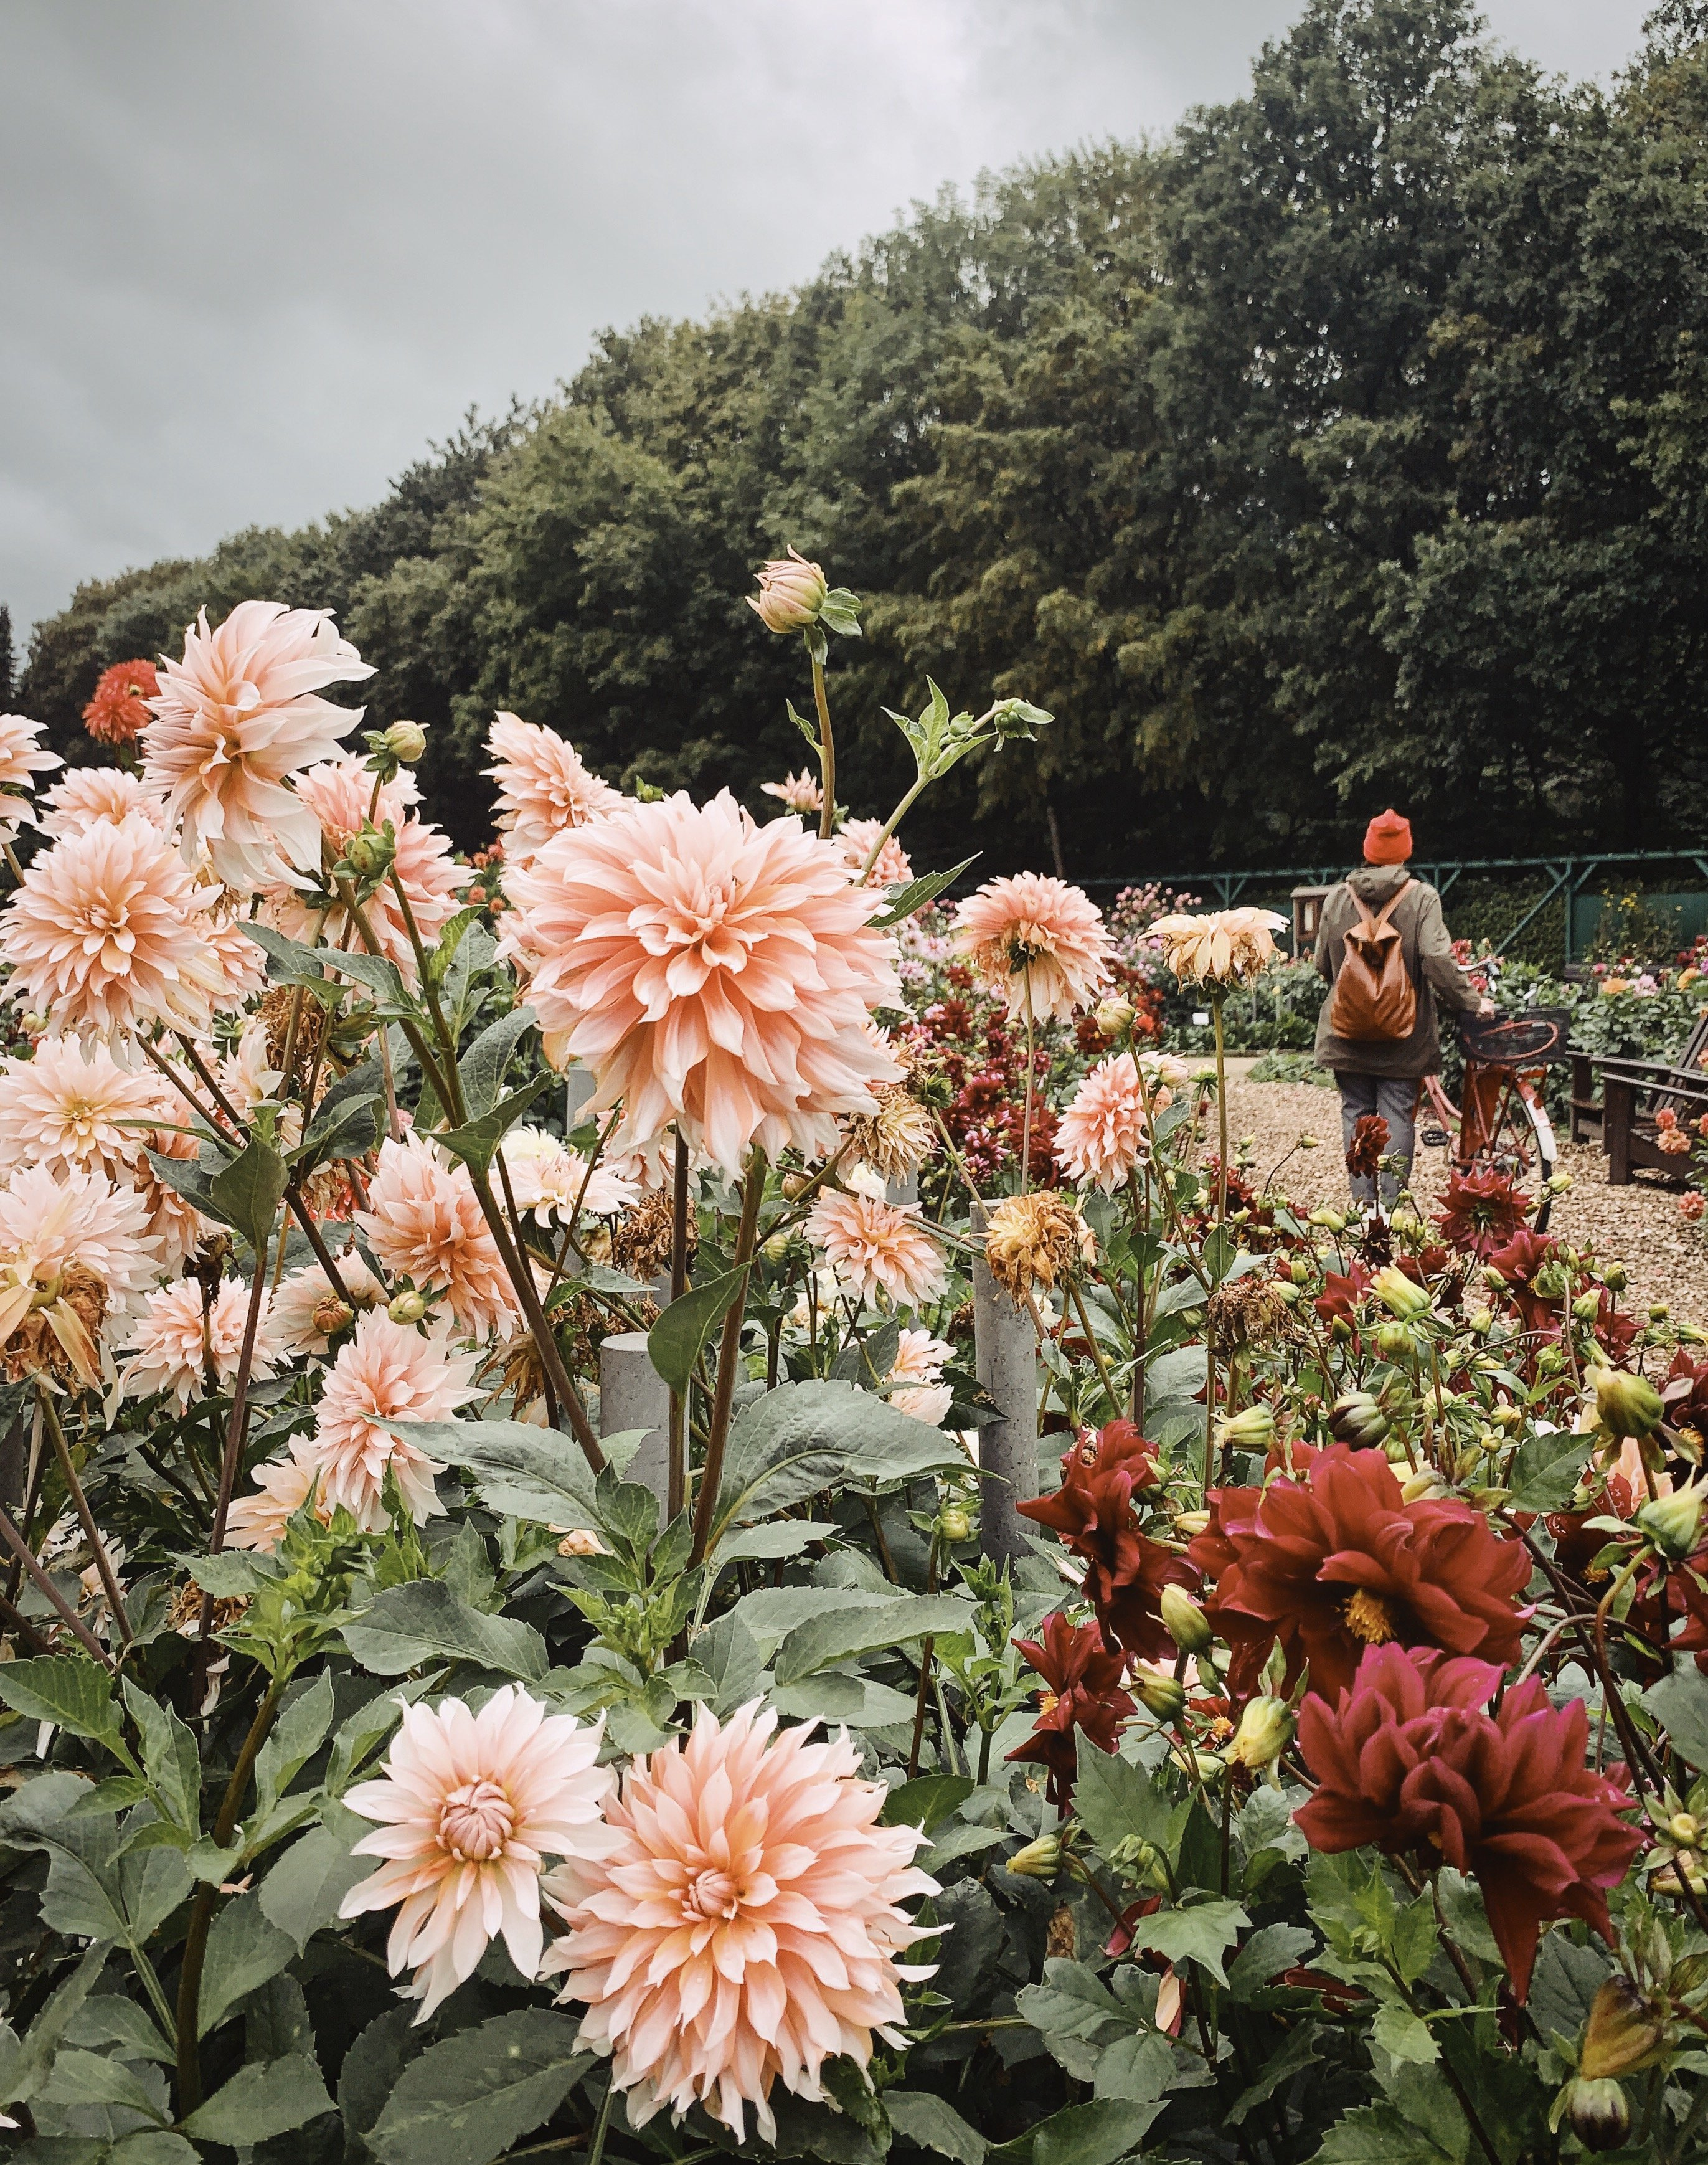 Hamburg Hotspot im Herbst: Dahliengarten am Volkspark